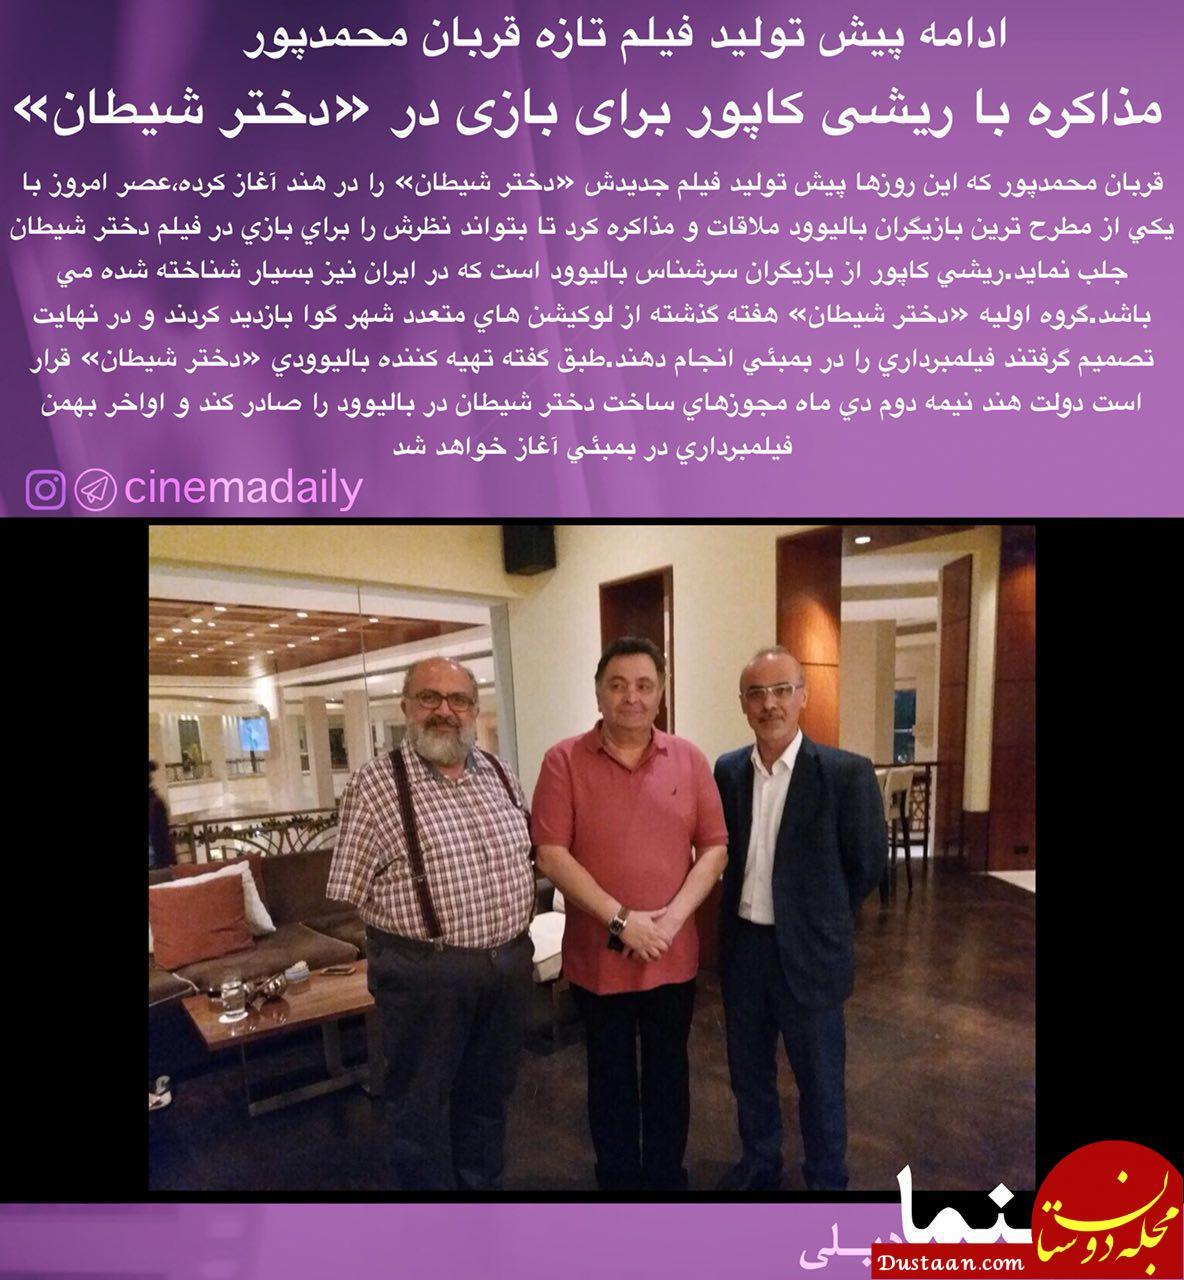 www.dustaan.com احتمال حضور بازیگر مشهور هندی در یک فیلم ایرانی +عکس